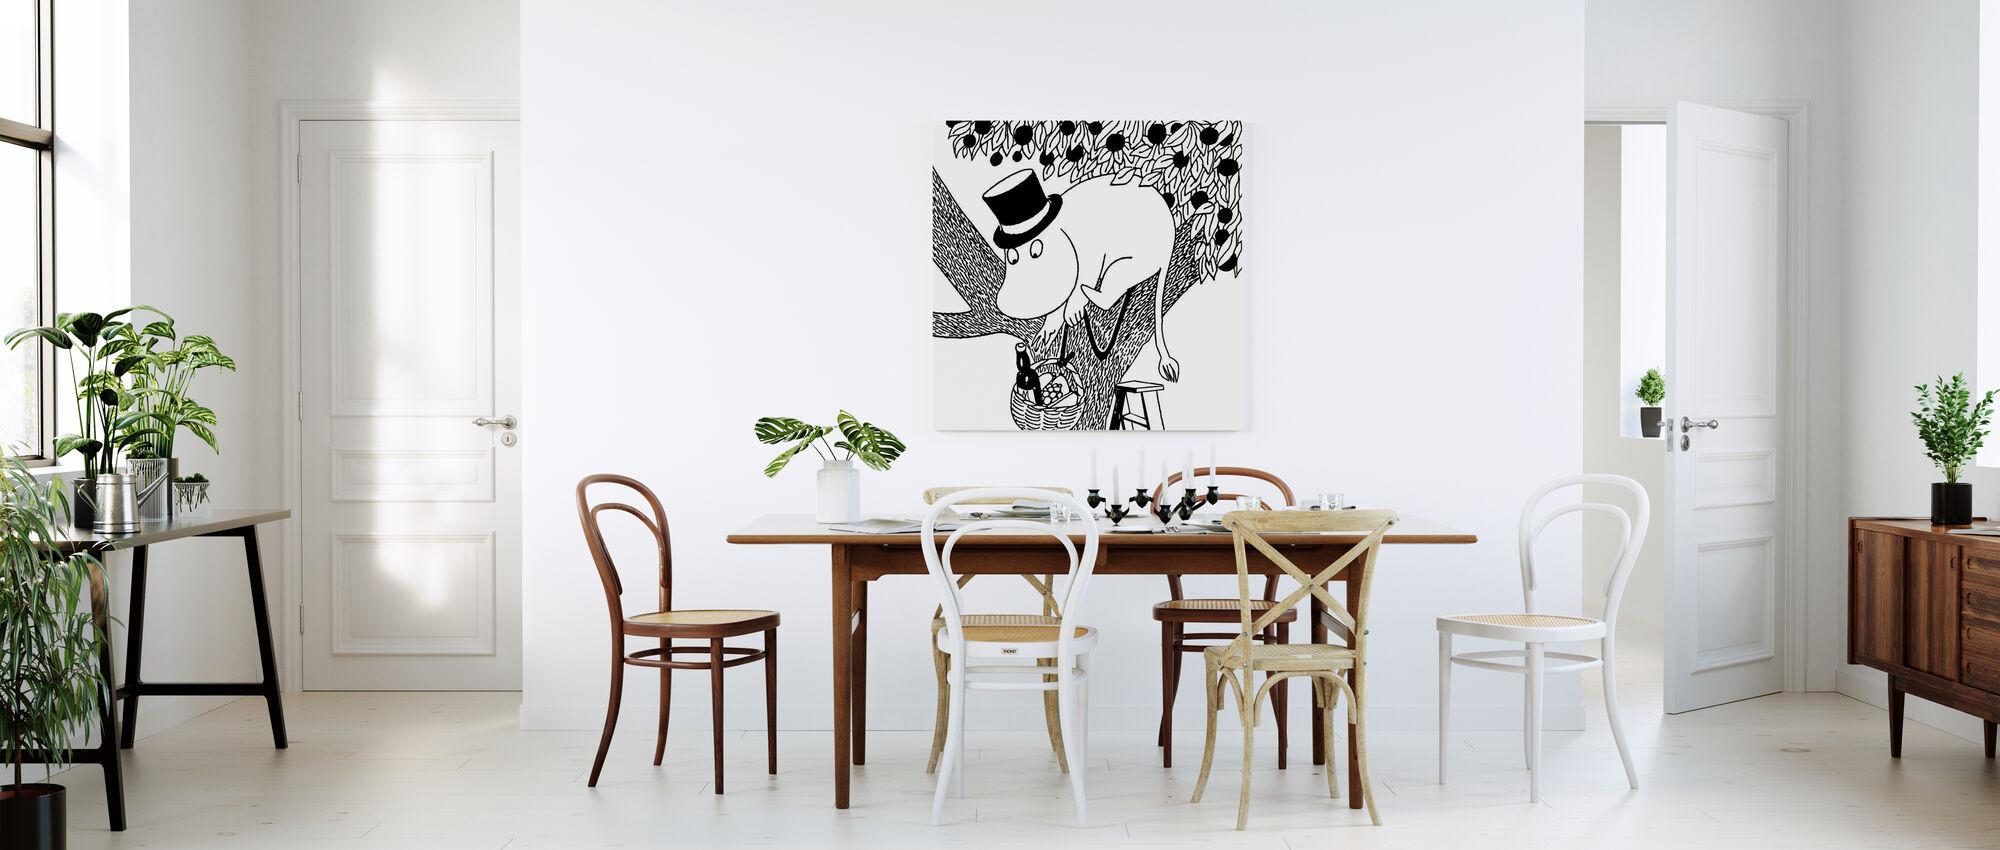 Moomin - Moominpappa the Epicurean - Canvas print - Kitchen